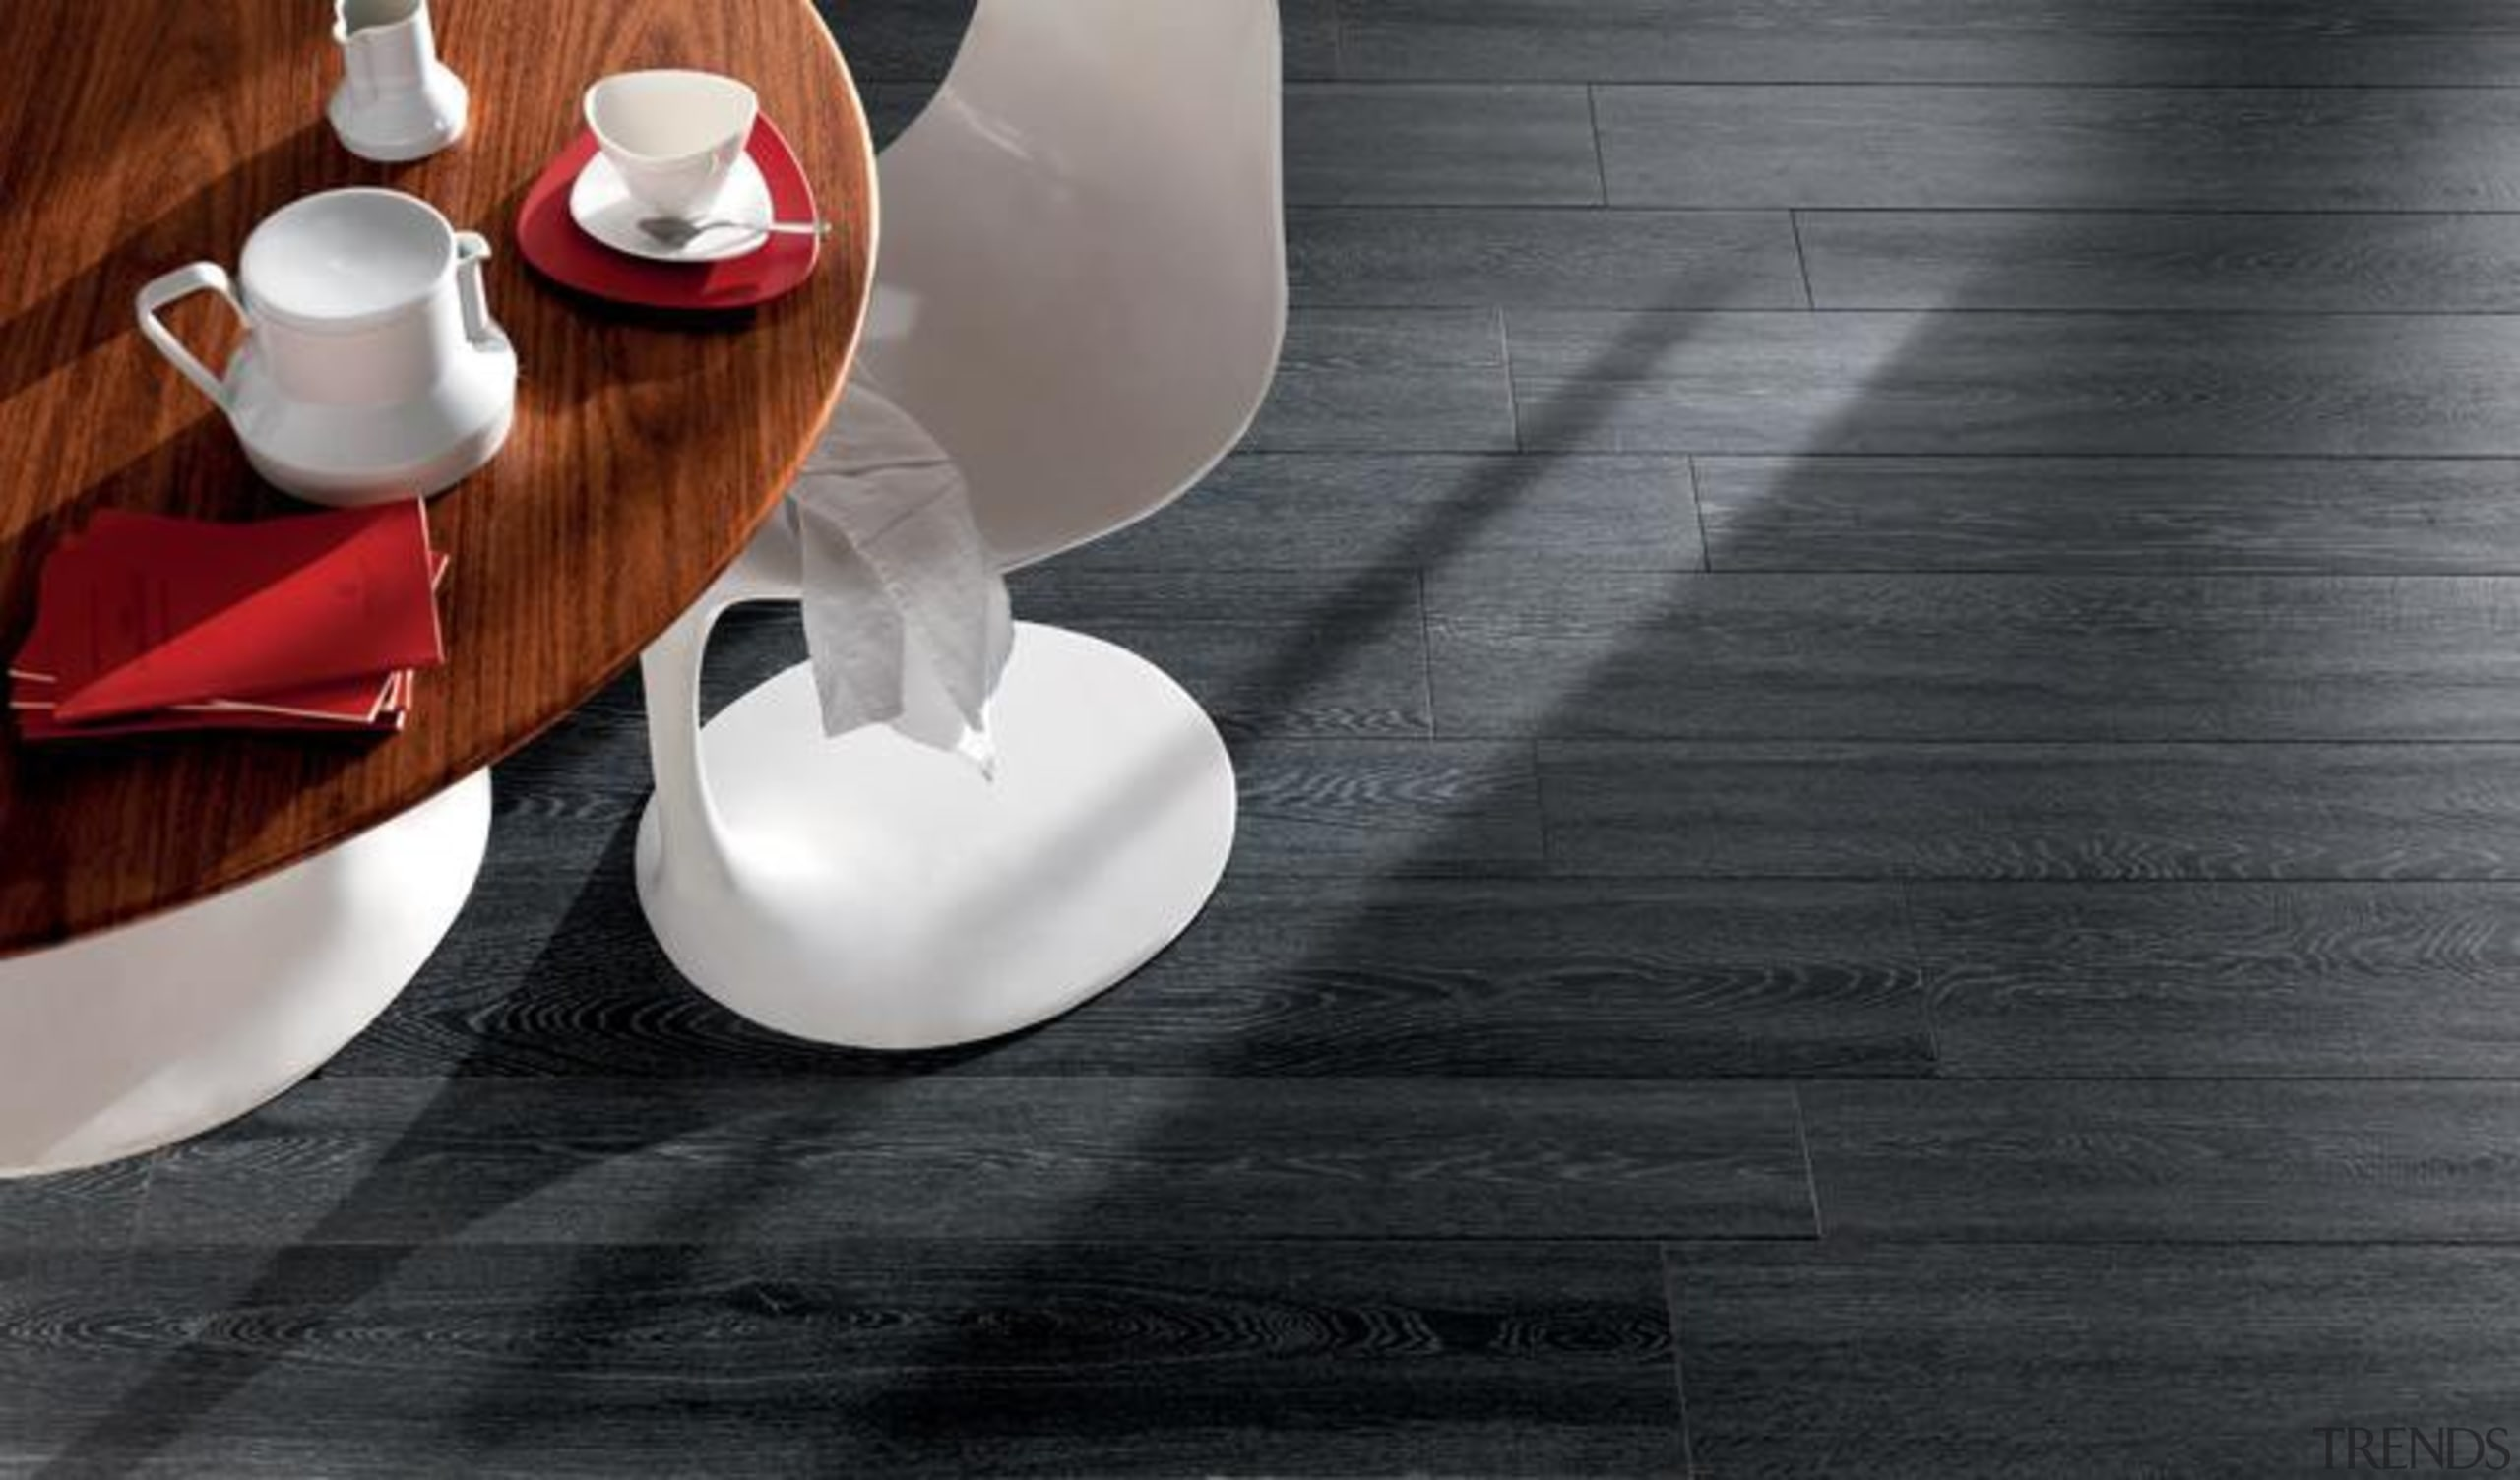 Bioplank oak lava interior anti-bacterial floor tiles. ceramic, floor, flooring, furniture, product design, still life photography, table, tableware, black, gray